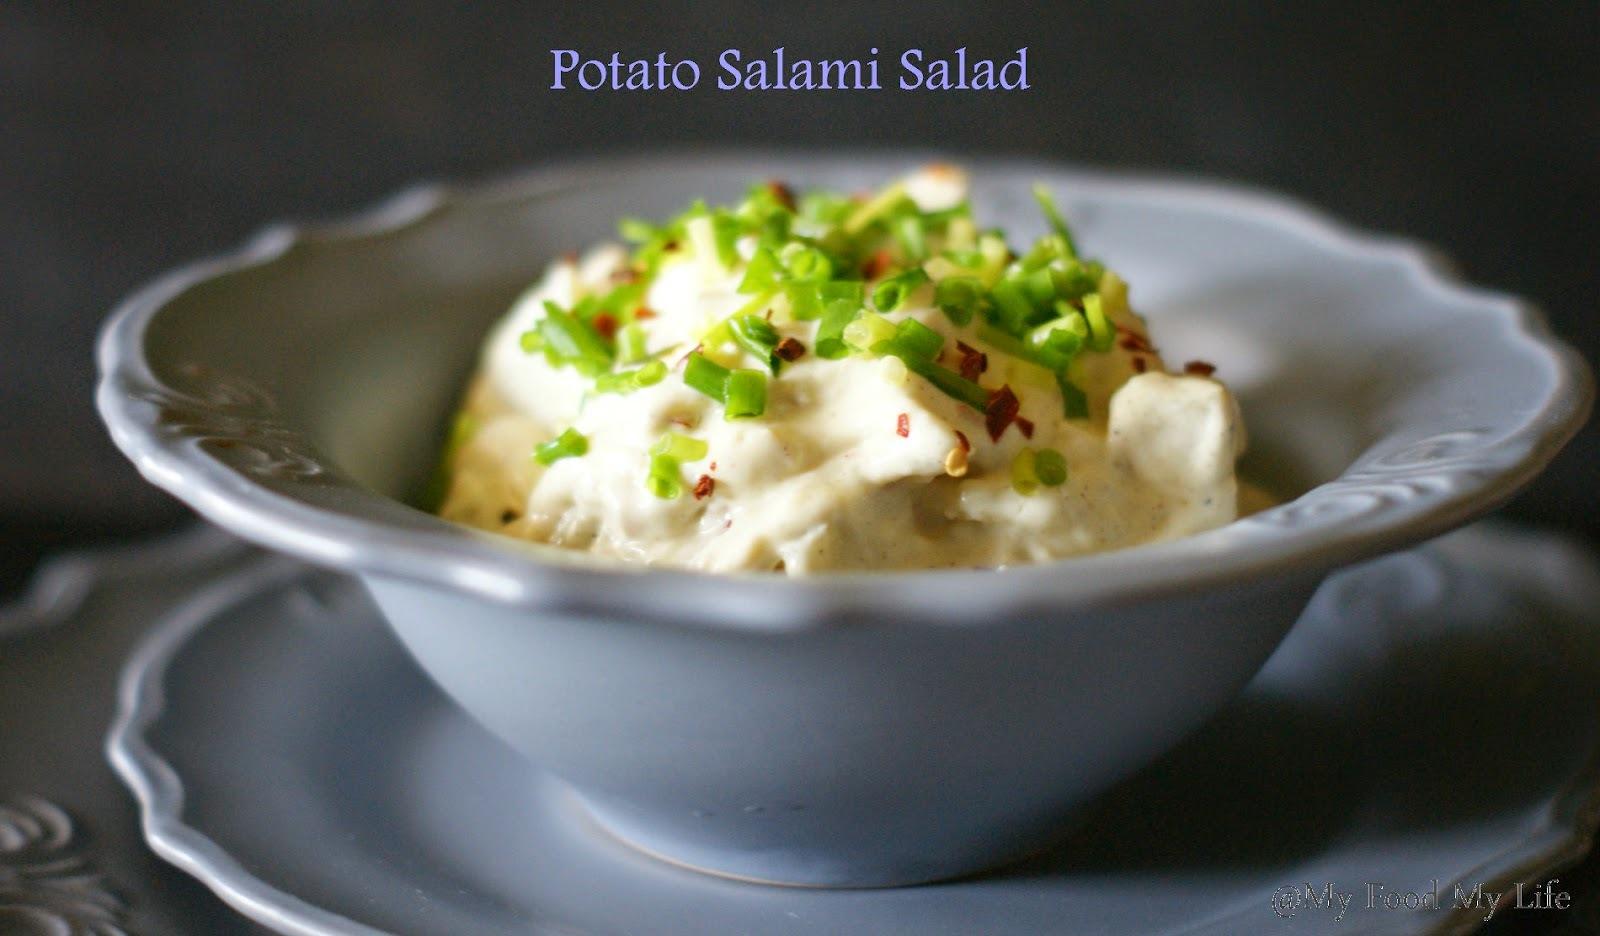 Potato Salami Salad - Creamy Deliciousness